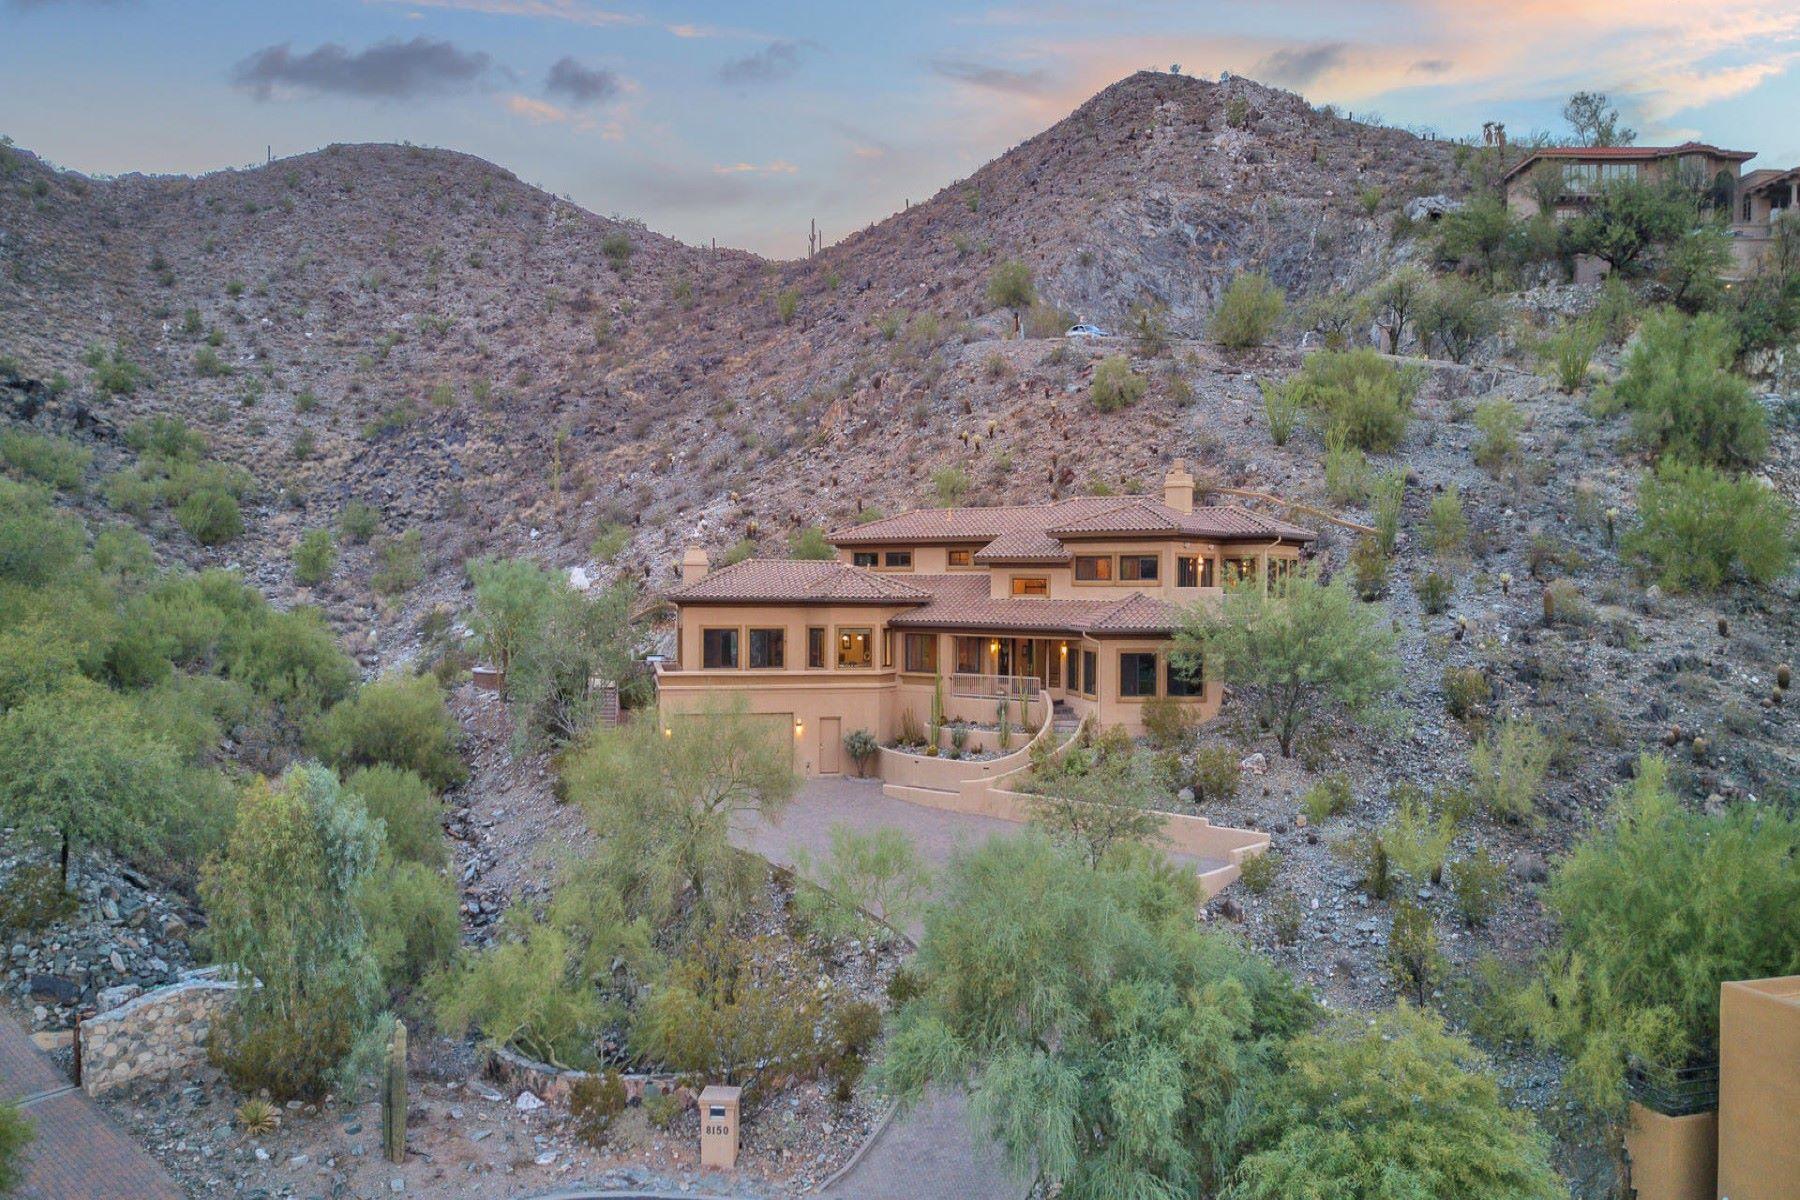 Tatum Canyon 8150 N 47TH ST Paradise Valley, Arizona 85253 Estados Unidos